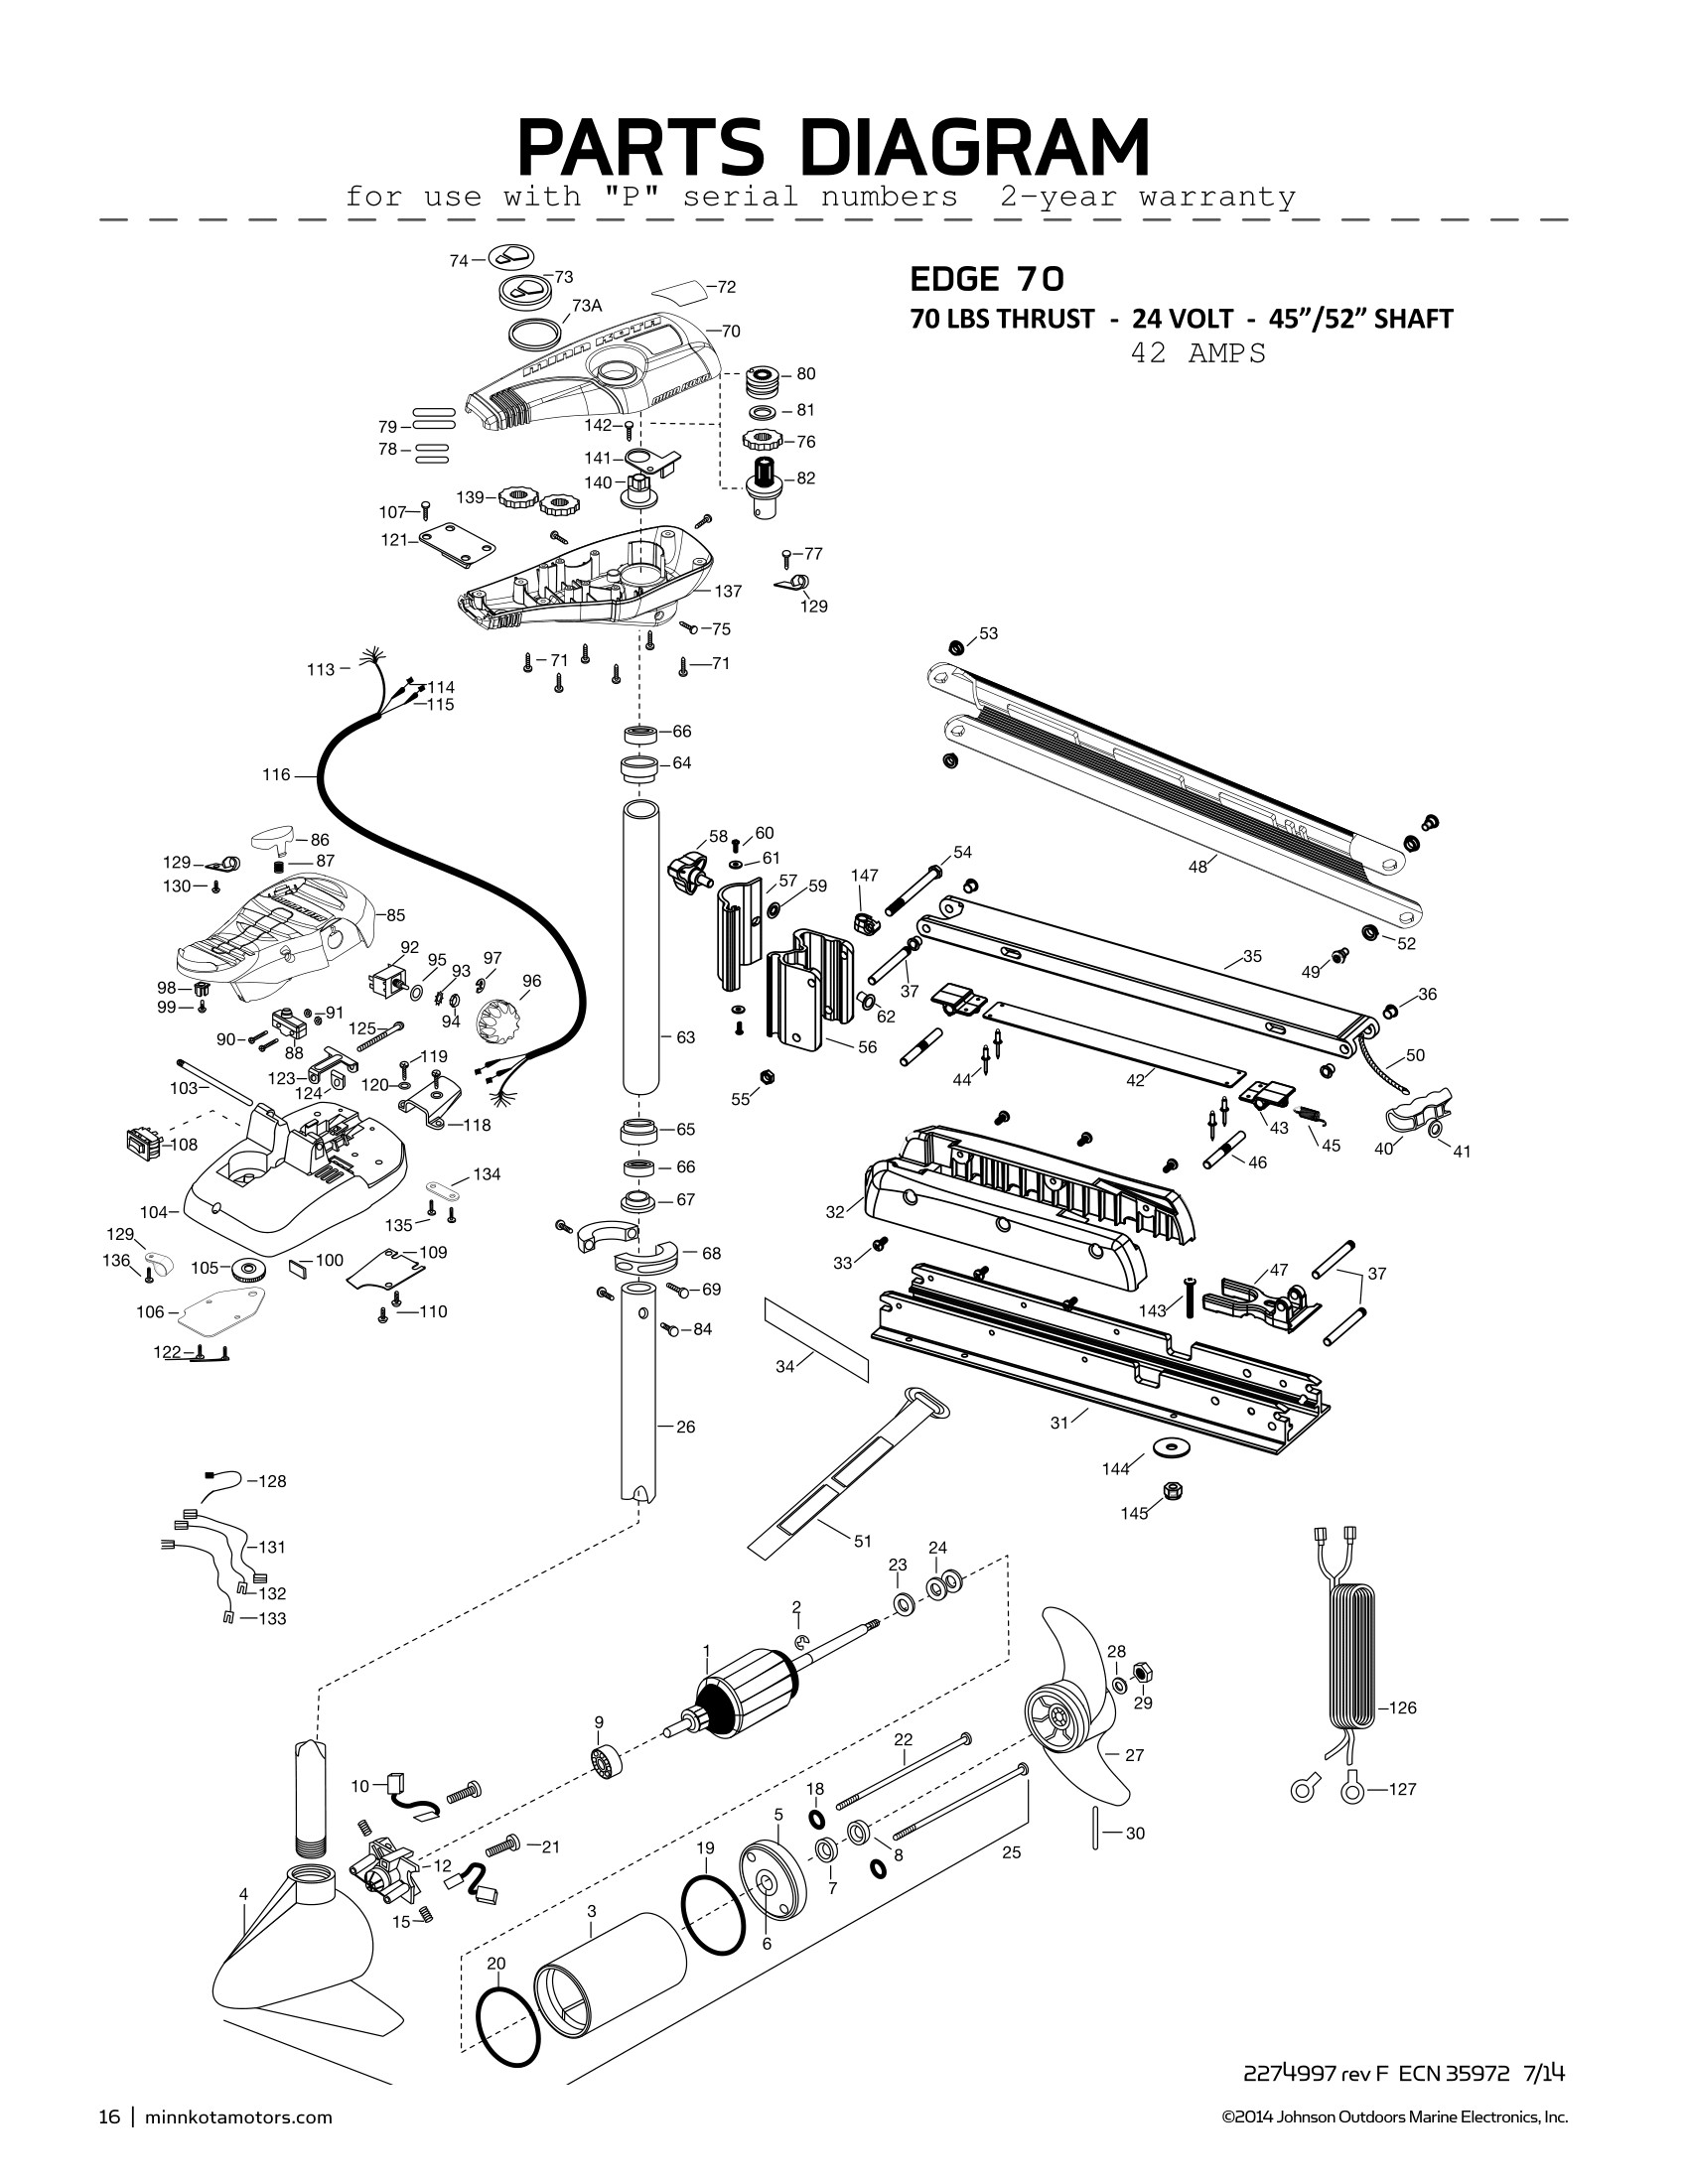 Electric Motor Parts Diagram Minn Kota Edge 70 Parts 2015 From Fish307 Of Electric Motor Parts Diagram